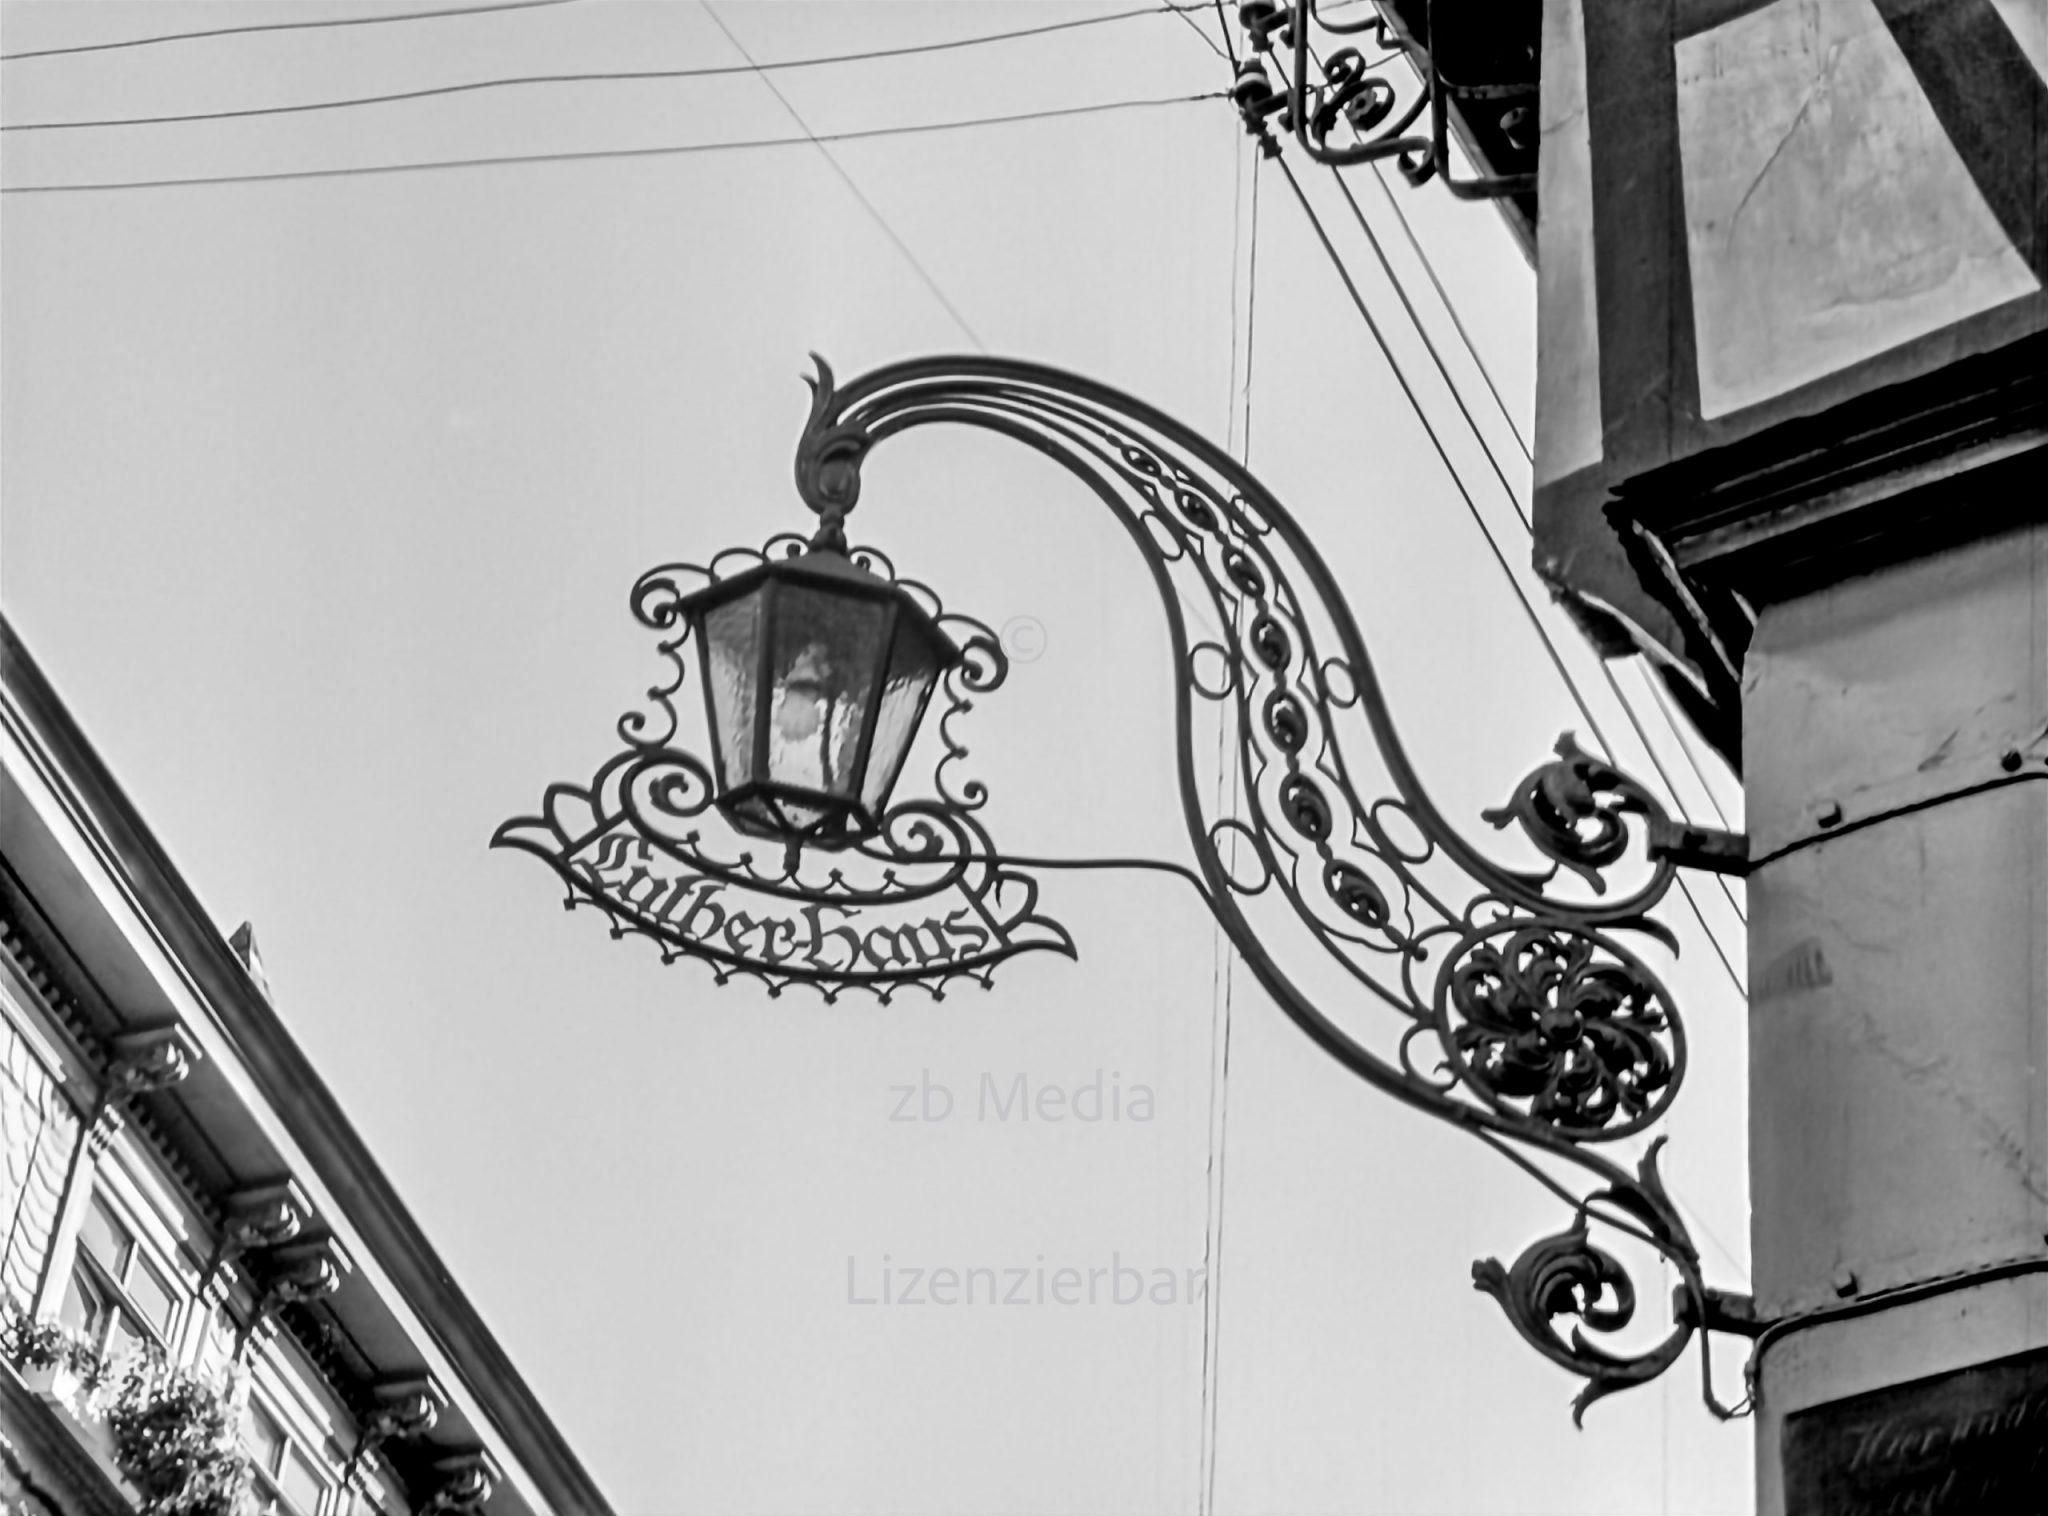 Lutherhaus Eisenach 1937